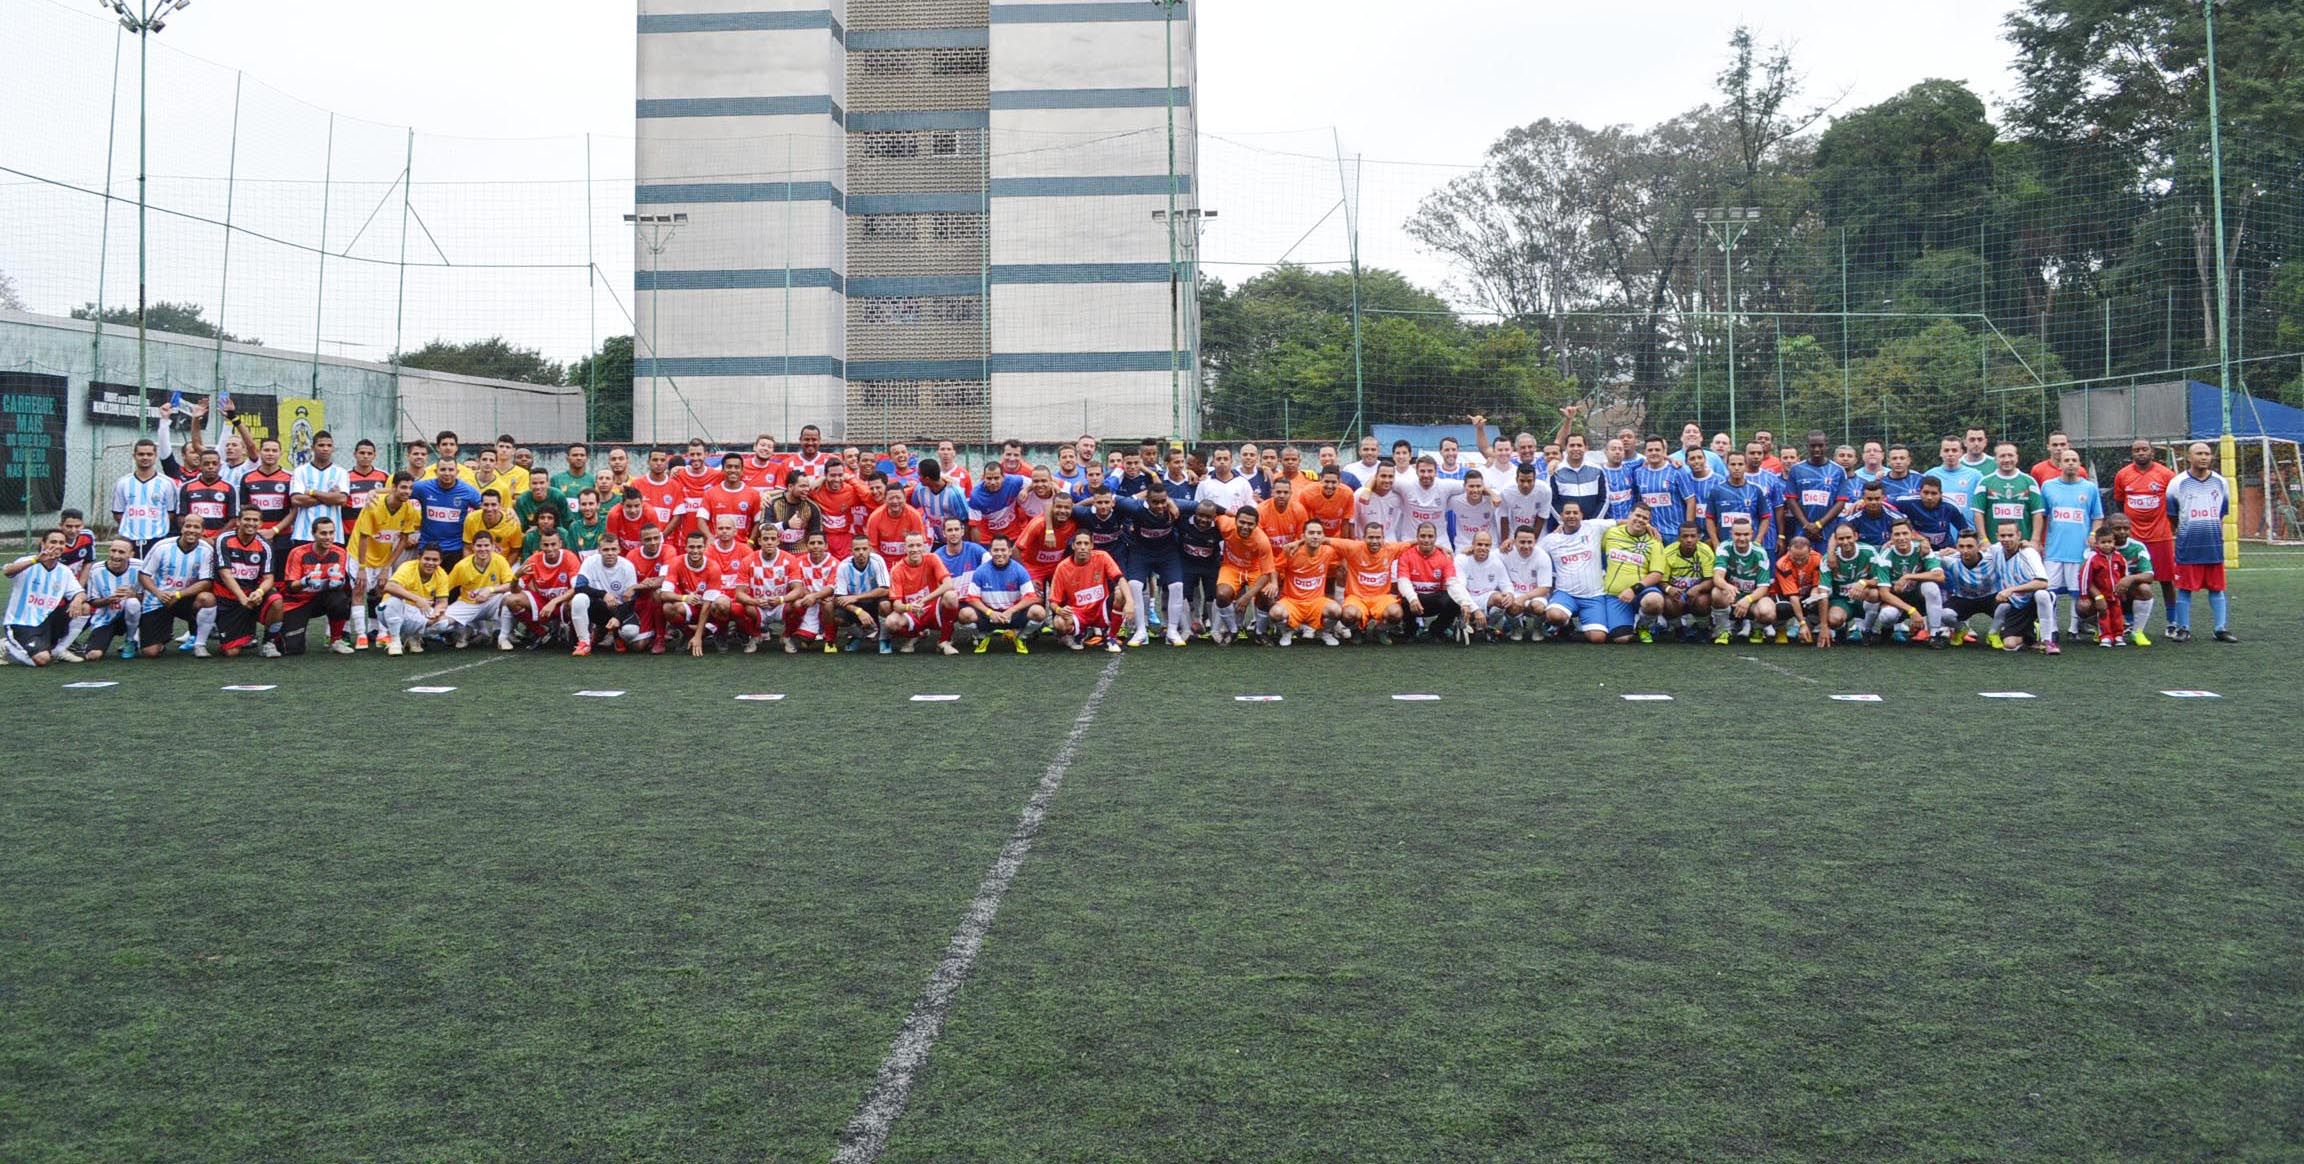 Copa Dia Brasil 2014 - 16 equipes